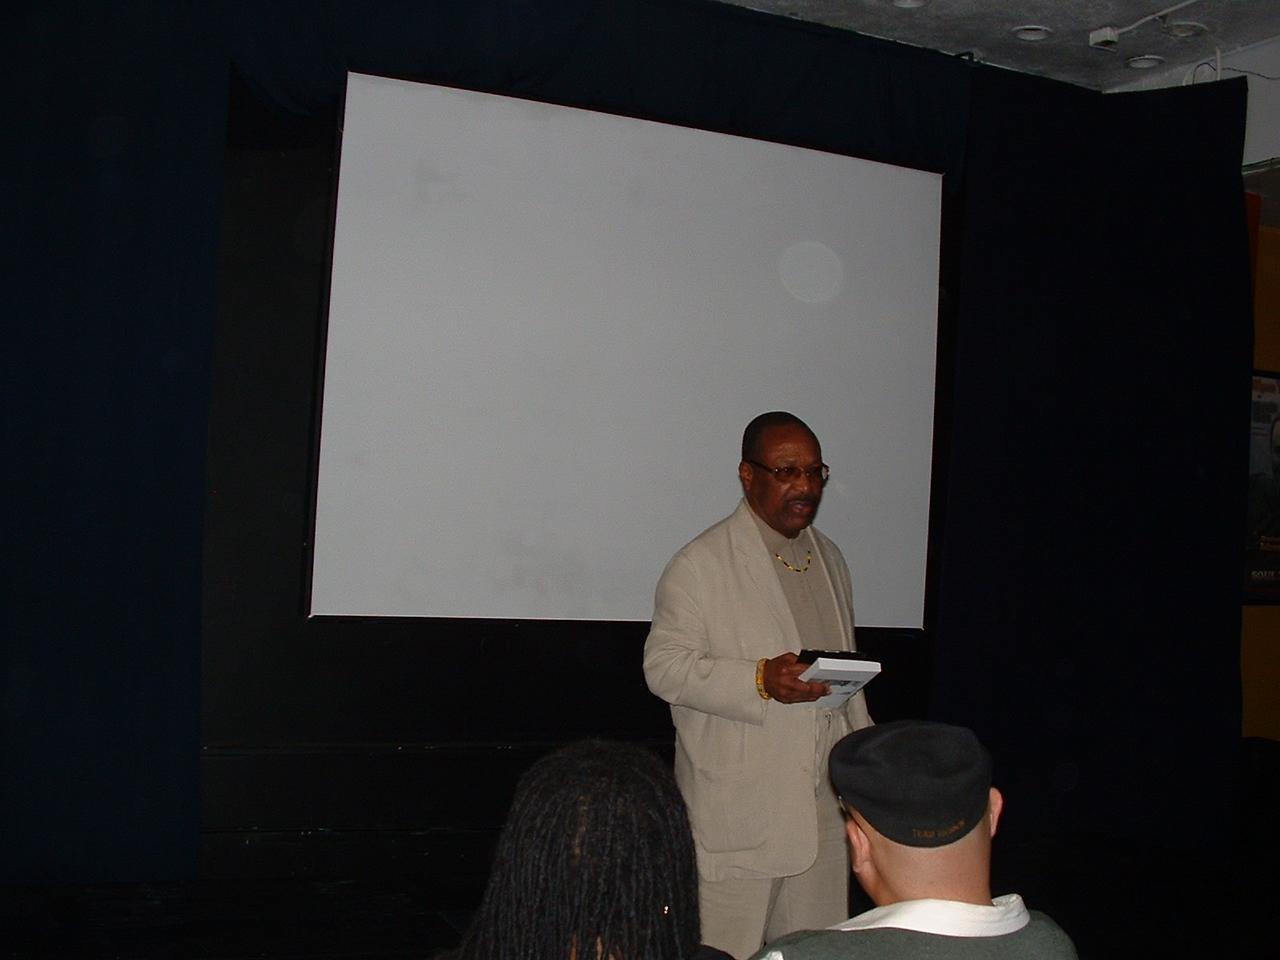 Back inside the gathering Dr. Kwaku kicks off the films on Dr. John Henrik Clarke shown that evening.